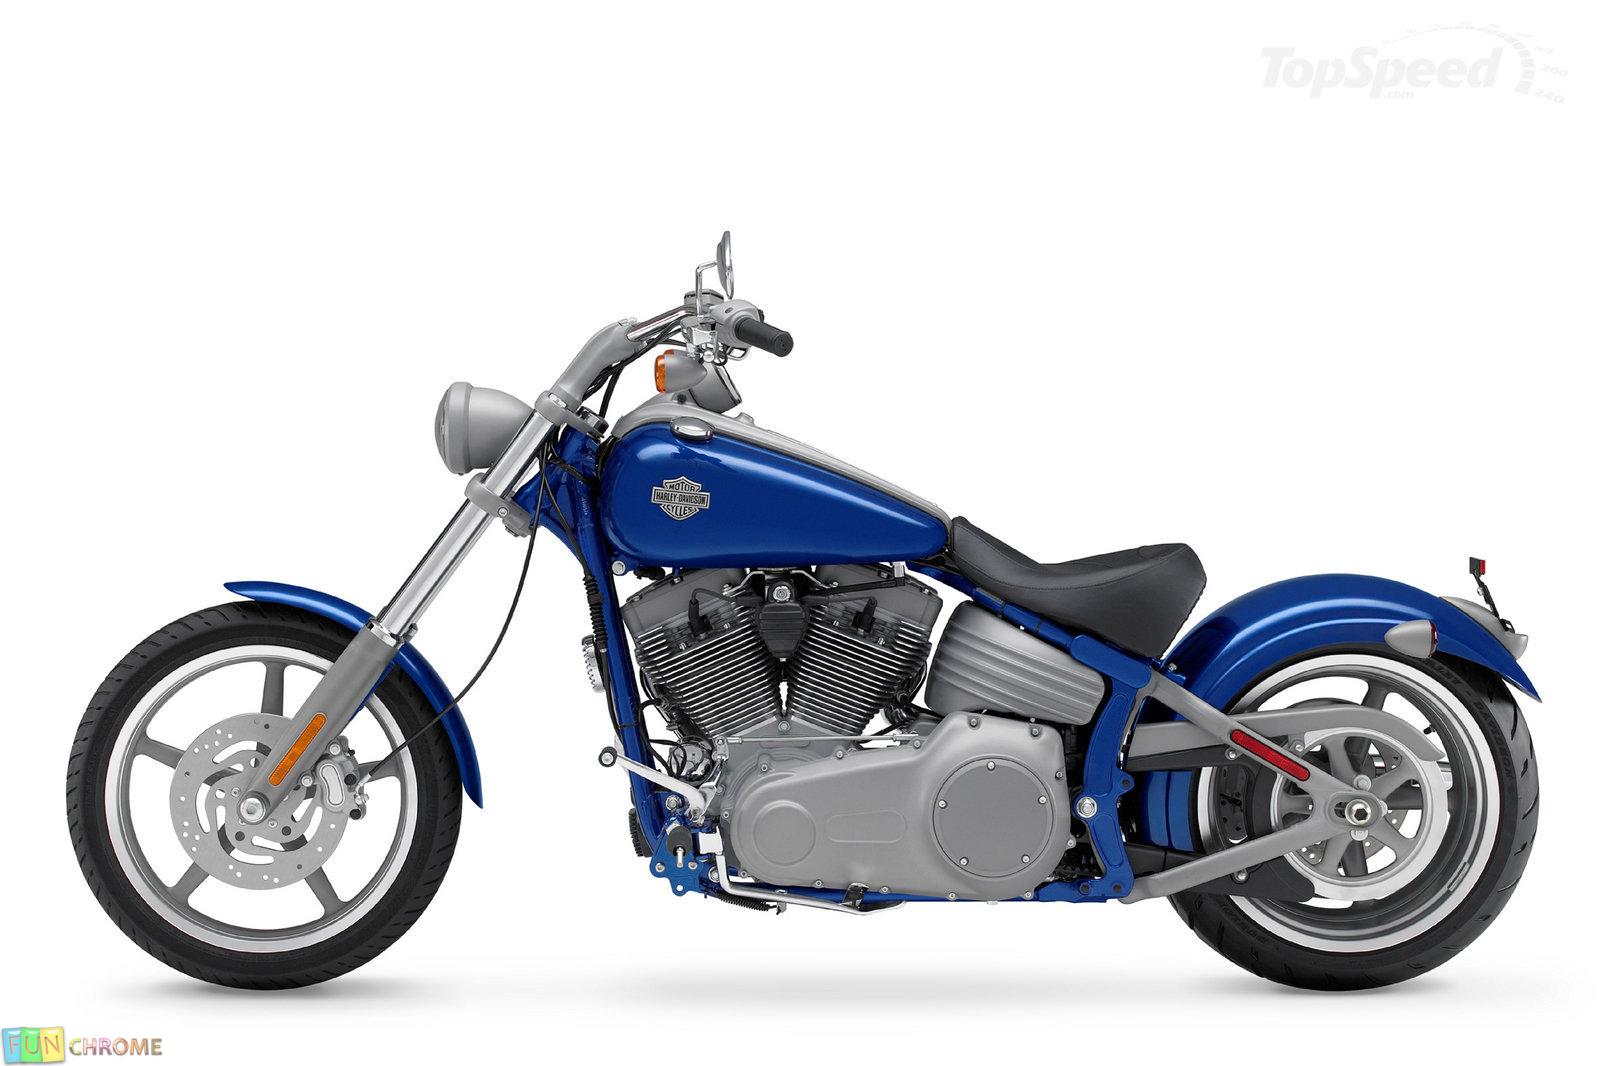 Harley Davidson Bikes Hd Wallpapers Free Download Desktop Bike